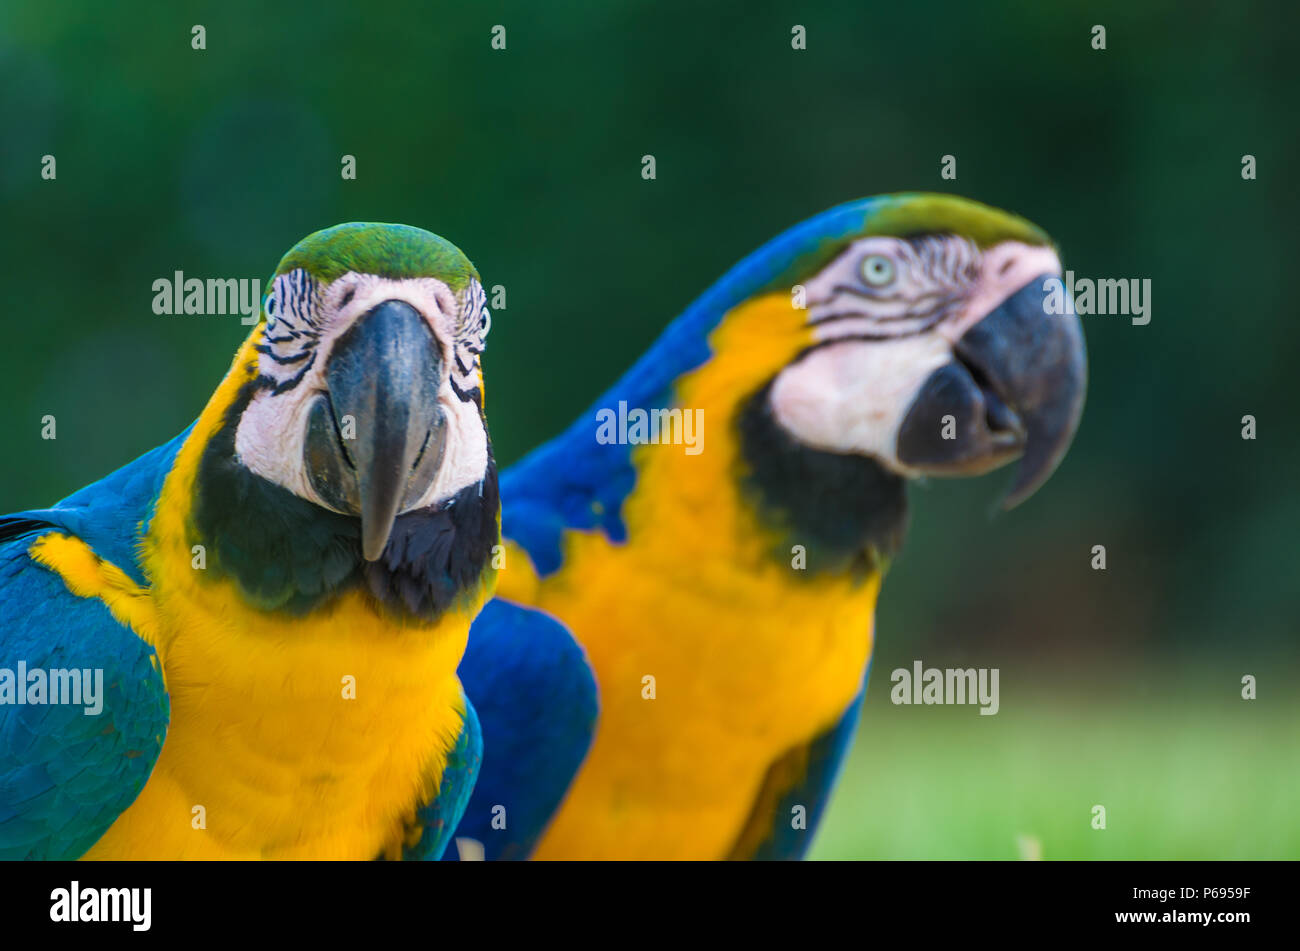 Beau bleu-et-jaune Macaw (Ara ararauna) dans le brésilien zone humide. Photo Stock